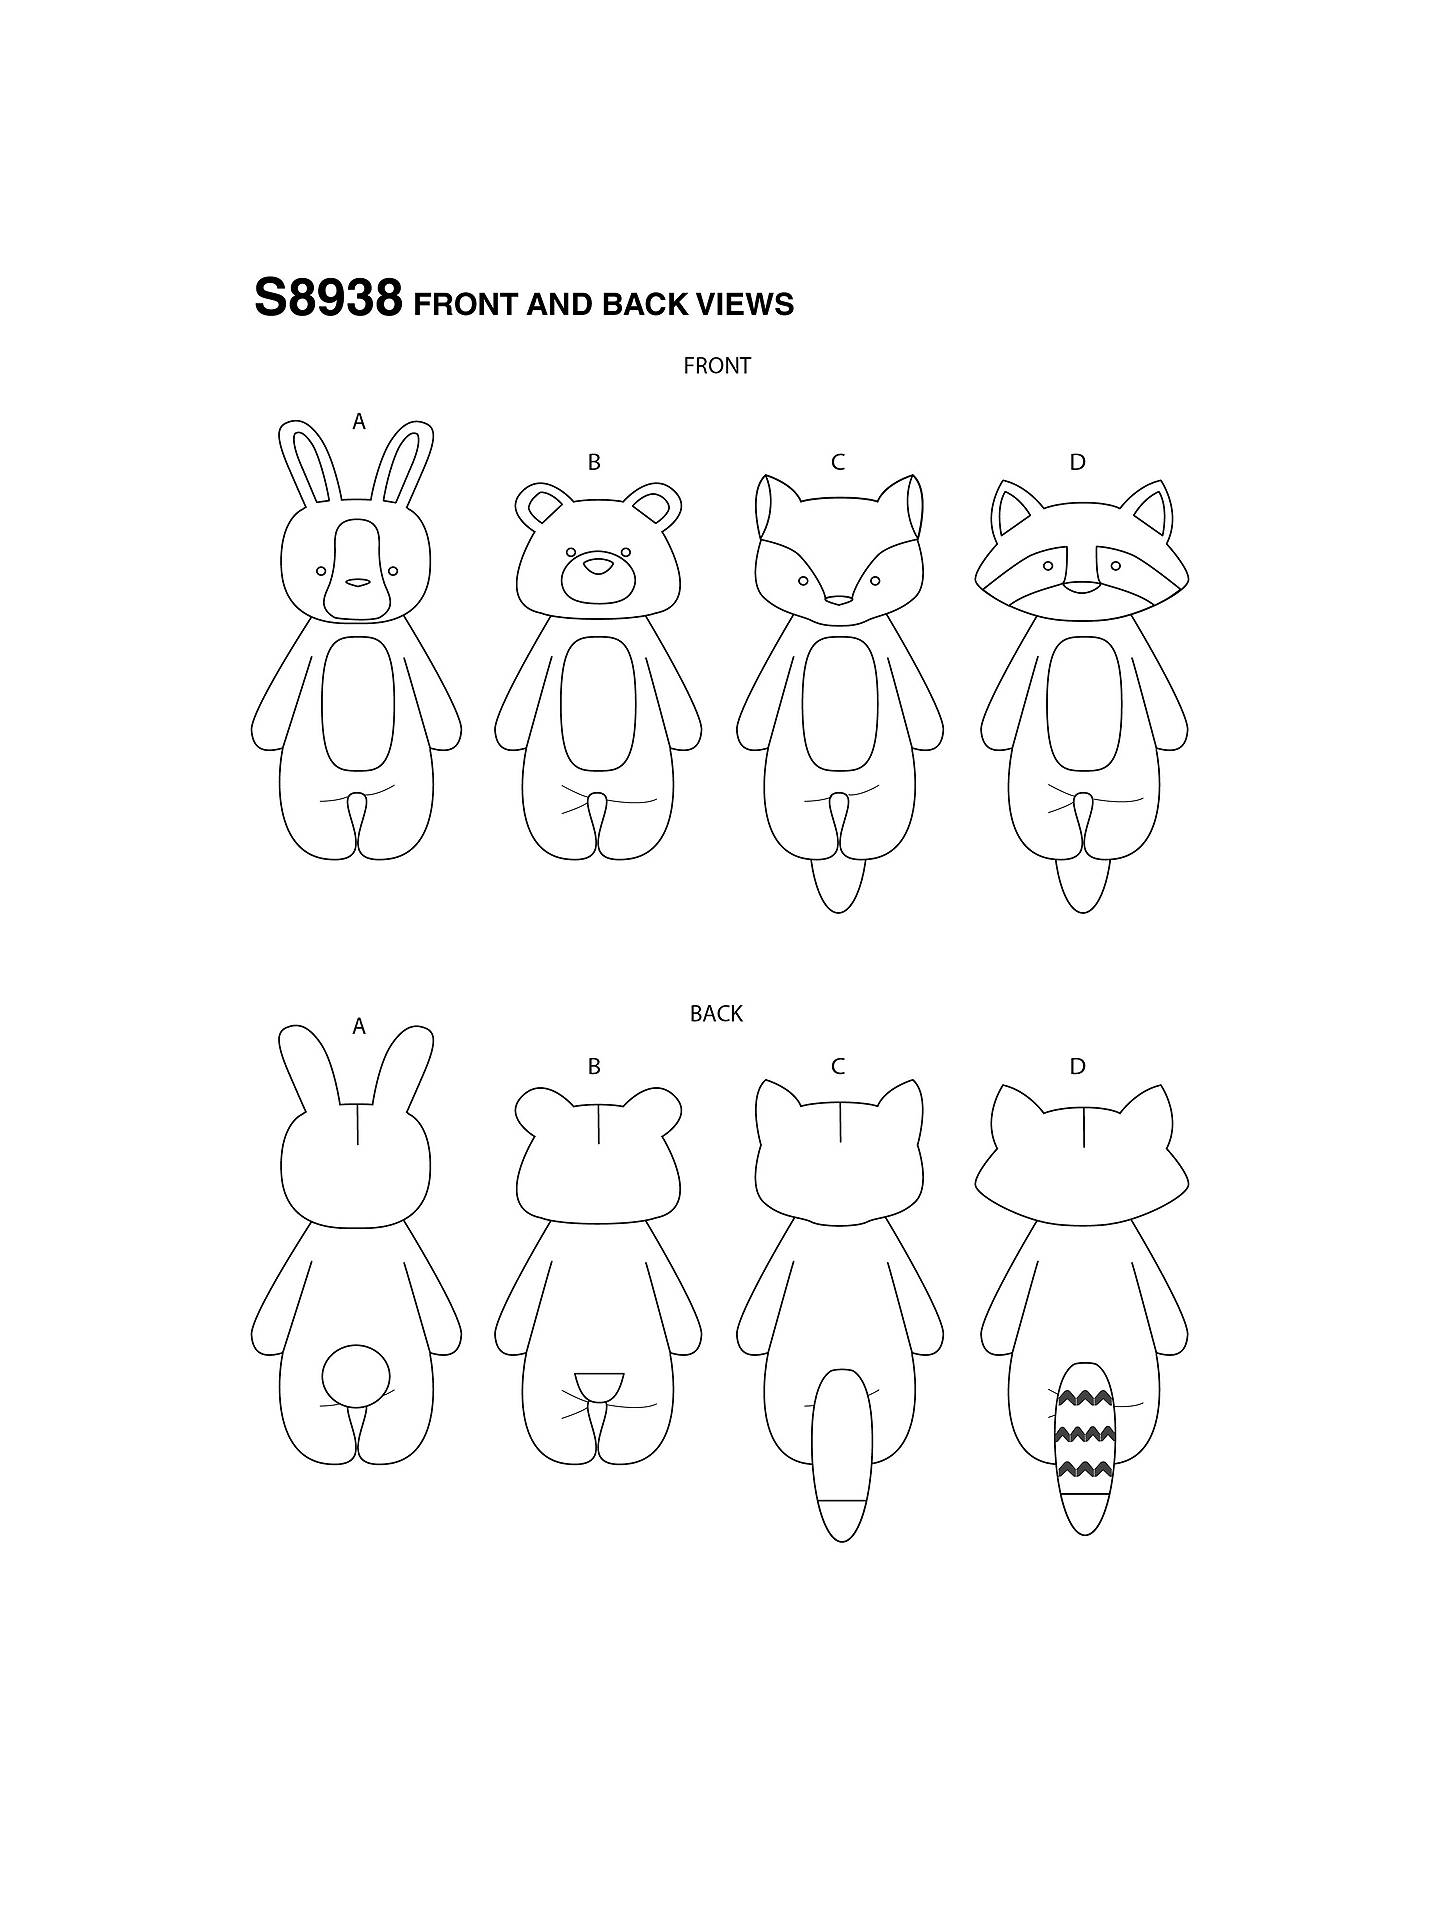 NEW BESTPRICE FREE GIFT LEGO ANIMALS FOX W// BLAZE PATTERN SELECT QTY